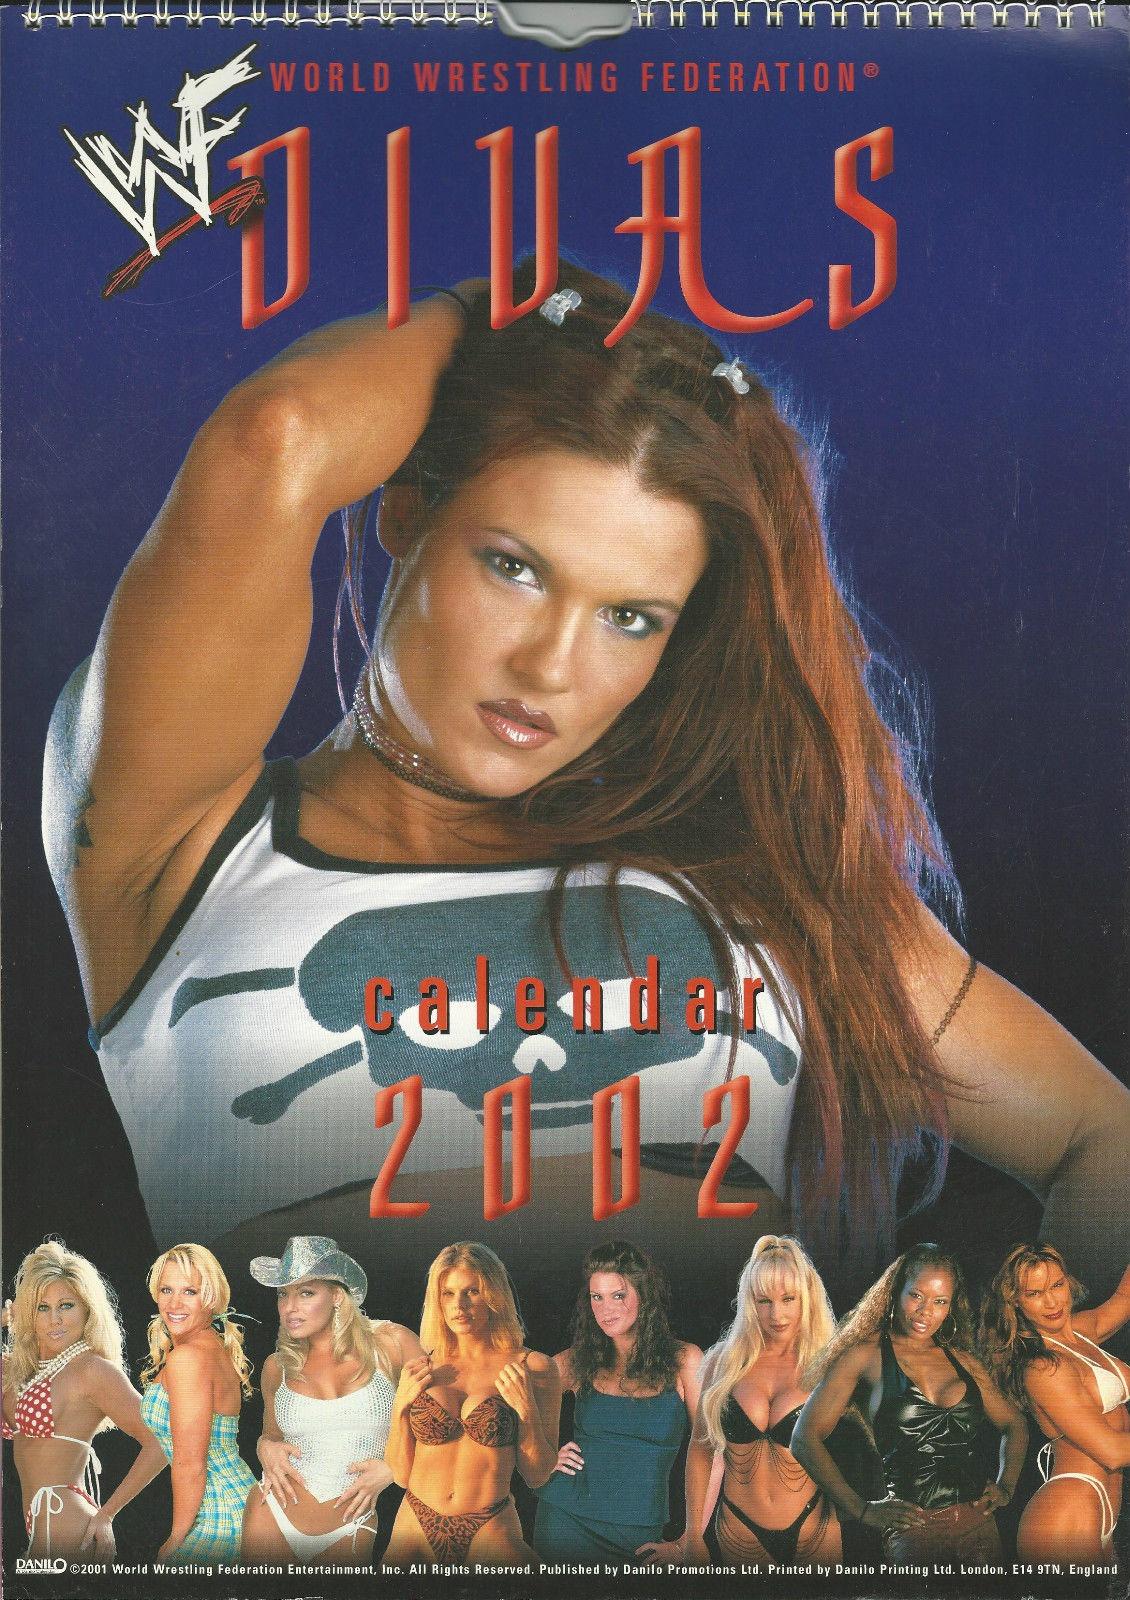 WWE WWF Divas Calendar 2002 Lita Trish Terri Debra Ivory #1